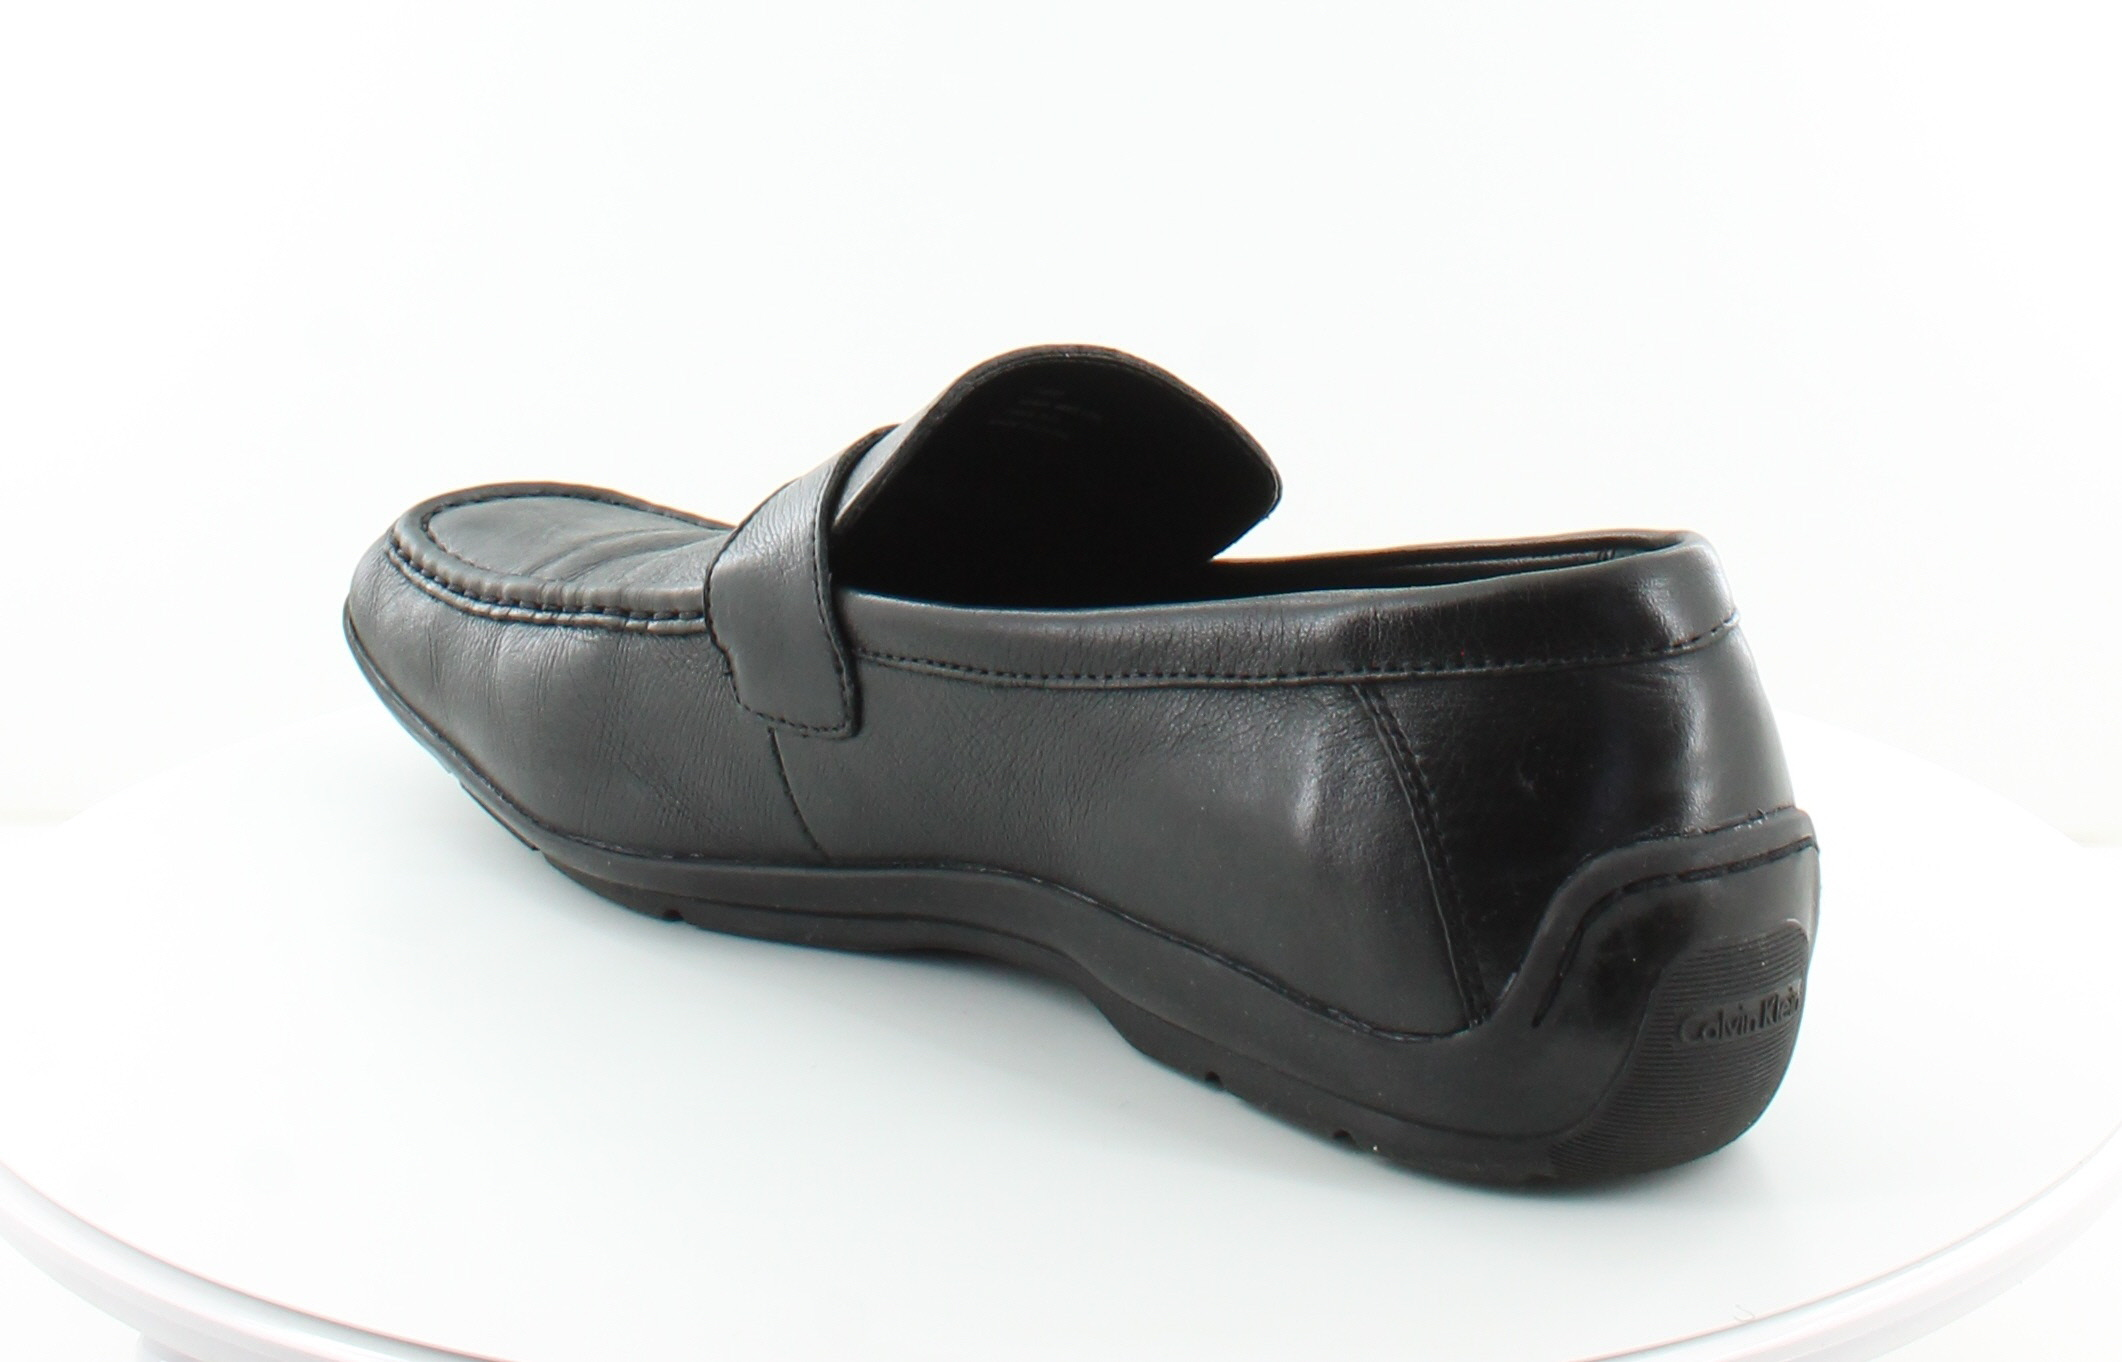 calvin klein heron black mens shoes size 13 m dress formal